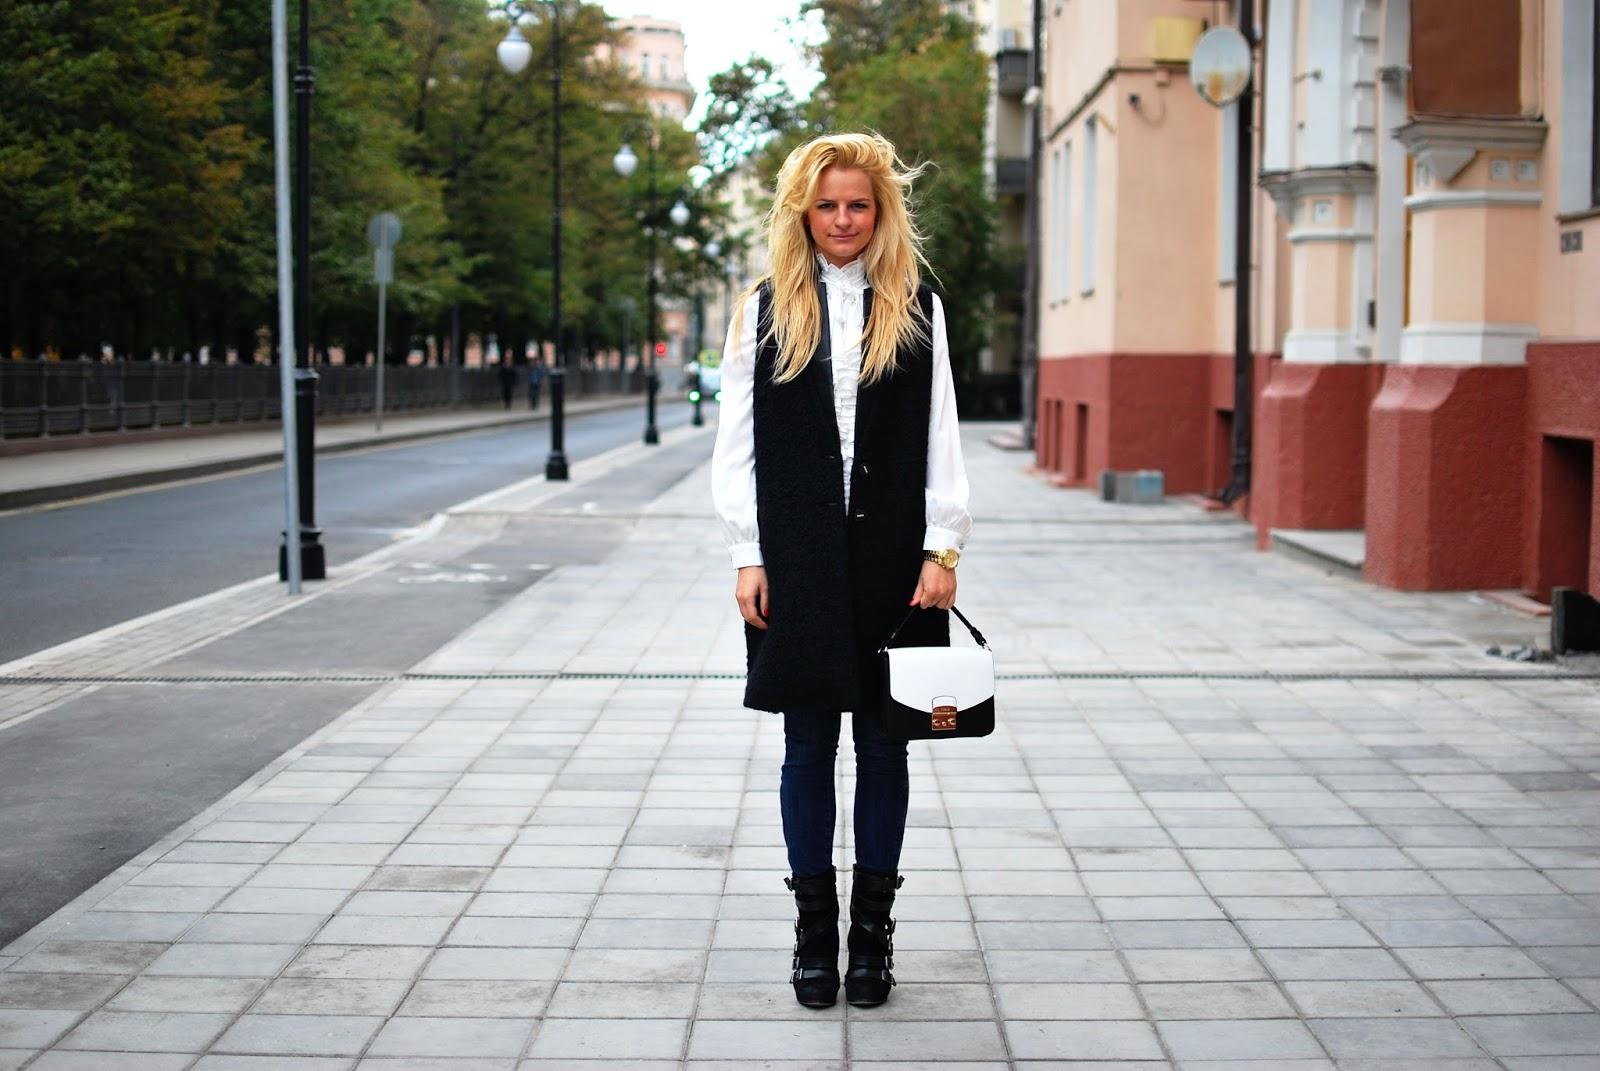 блогер, модный блог, блог о моде, уличная мода 2015, streetfashion, street style, fashion blog russia, fashion foto 2016, fashion trends autumn